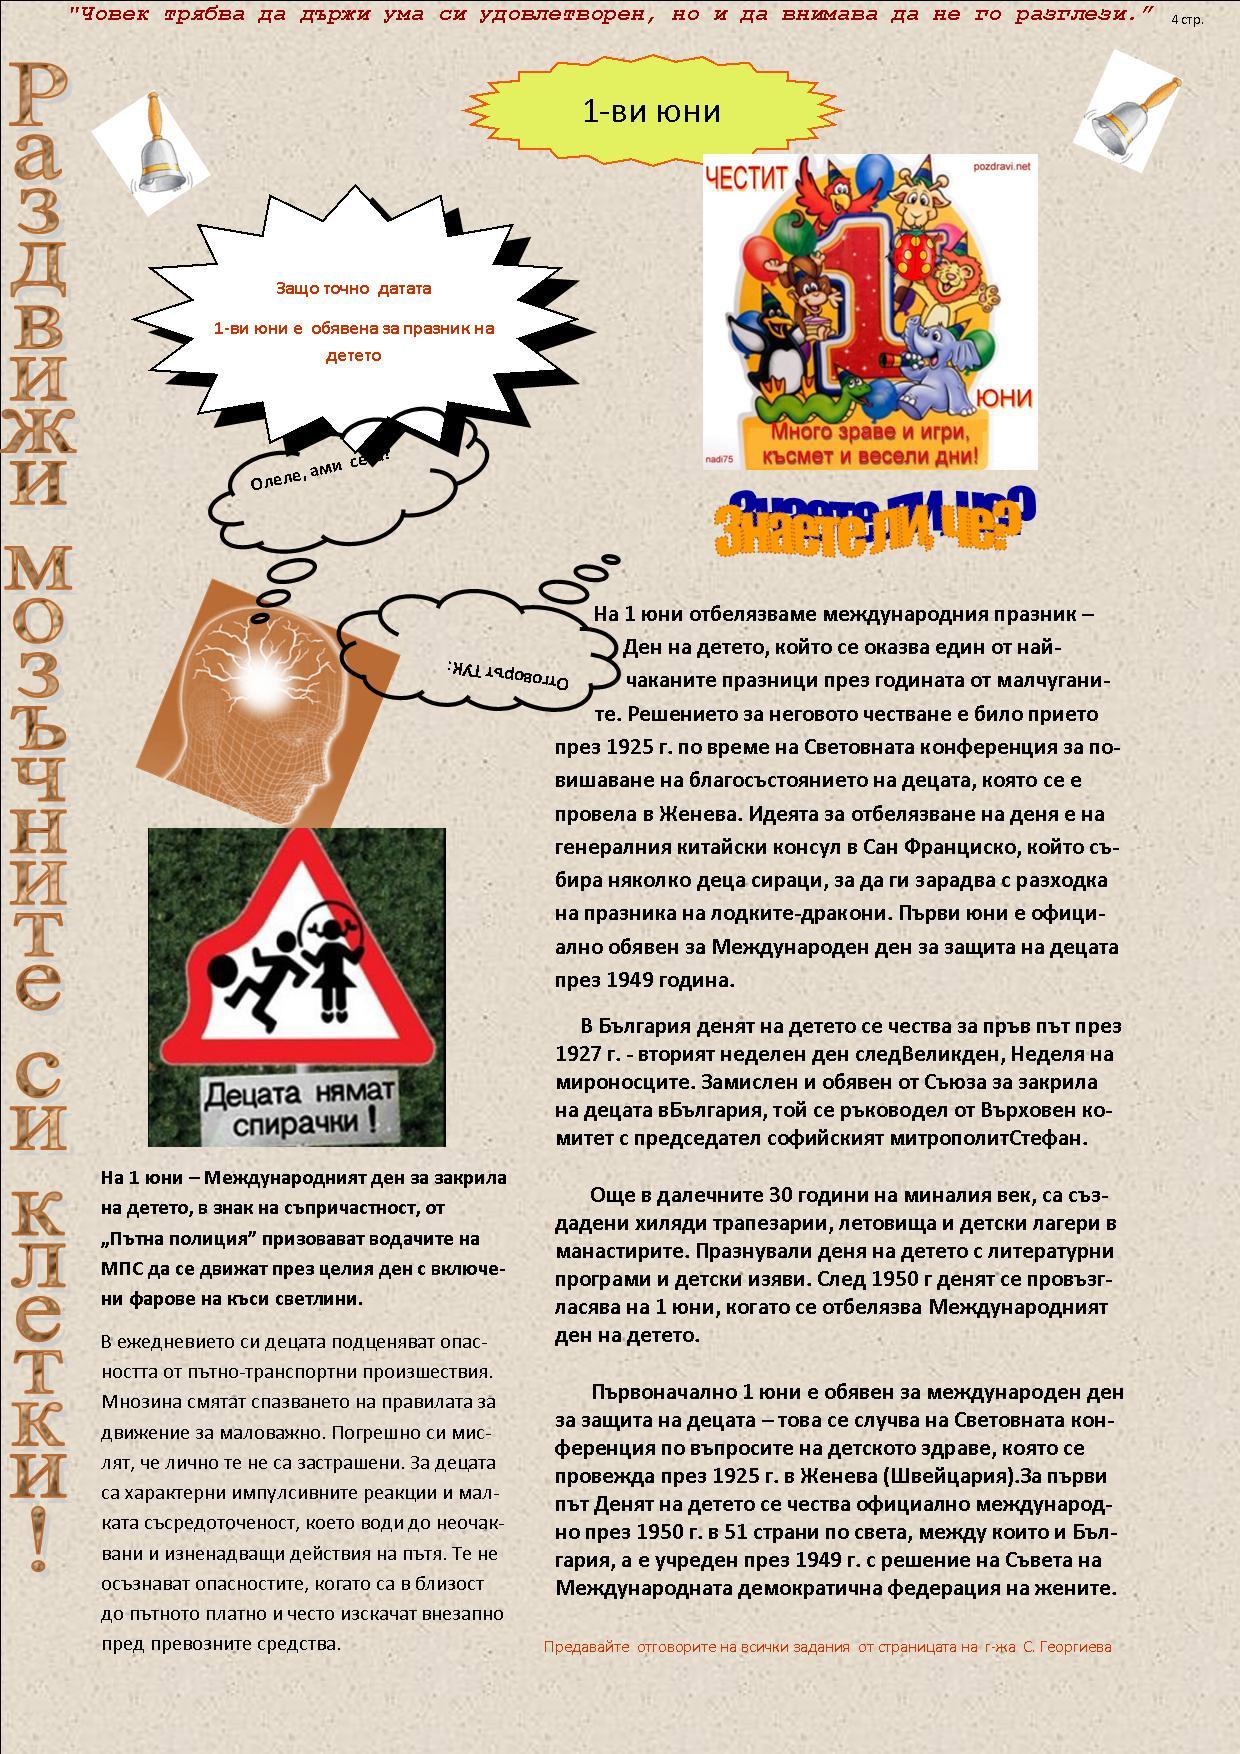 1вестник-6-ти бр-юни-стр-4 - 2013